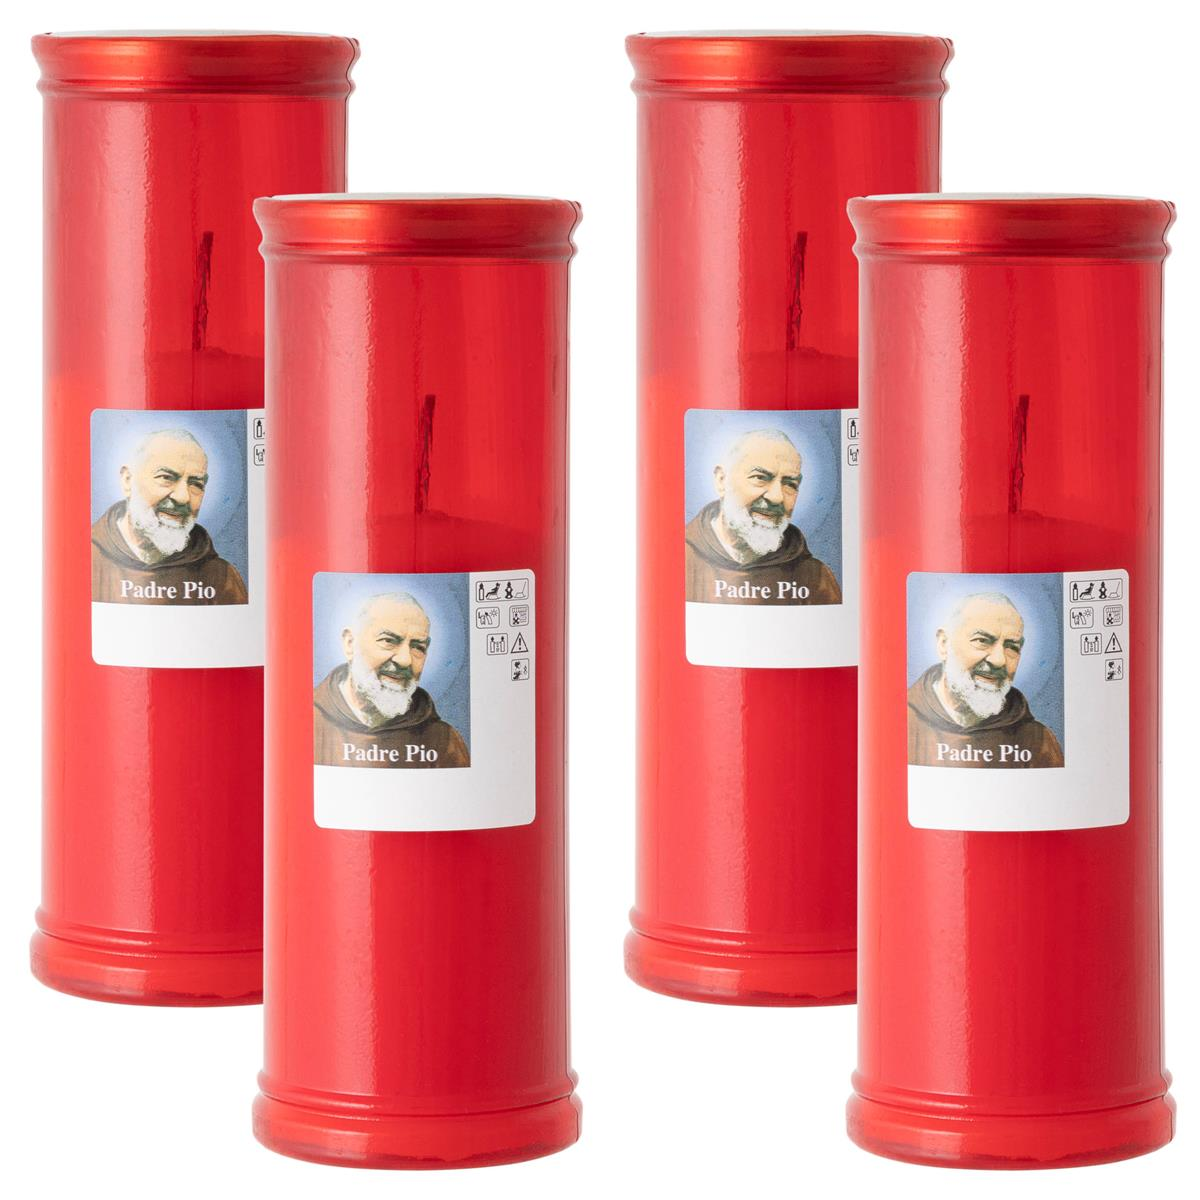 4er Set Grablicht Padre Pio rot 19x6,5 cm Friedhofskerzen 96h Trauerkerze